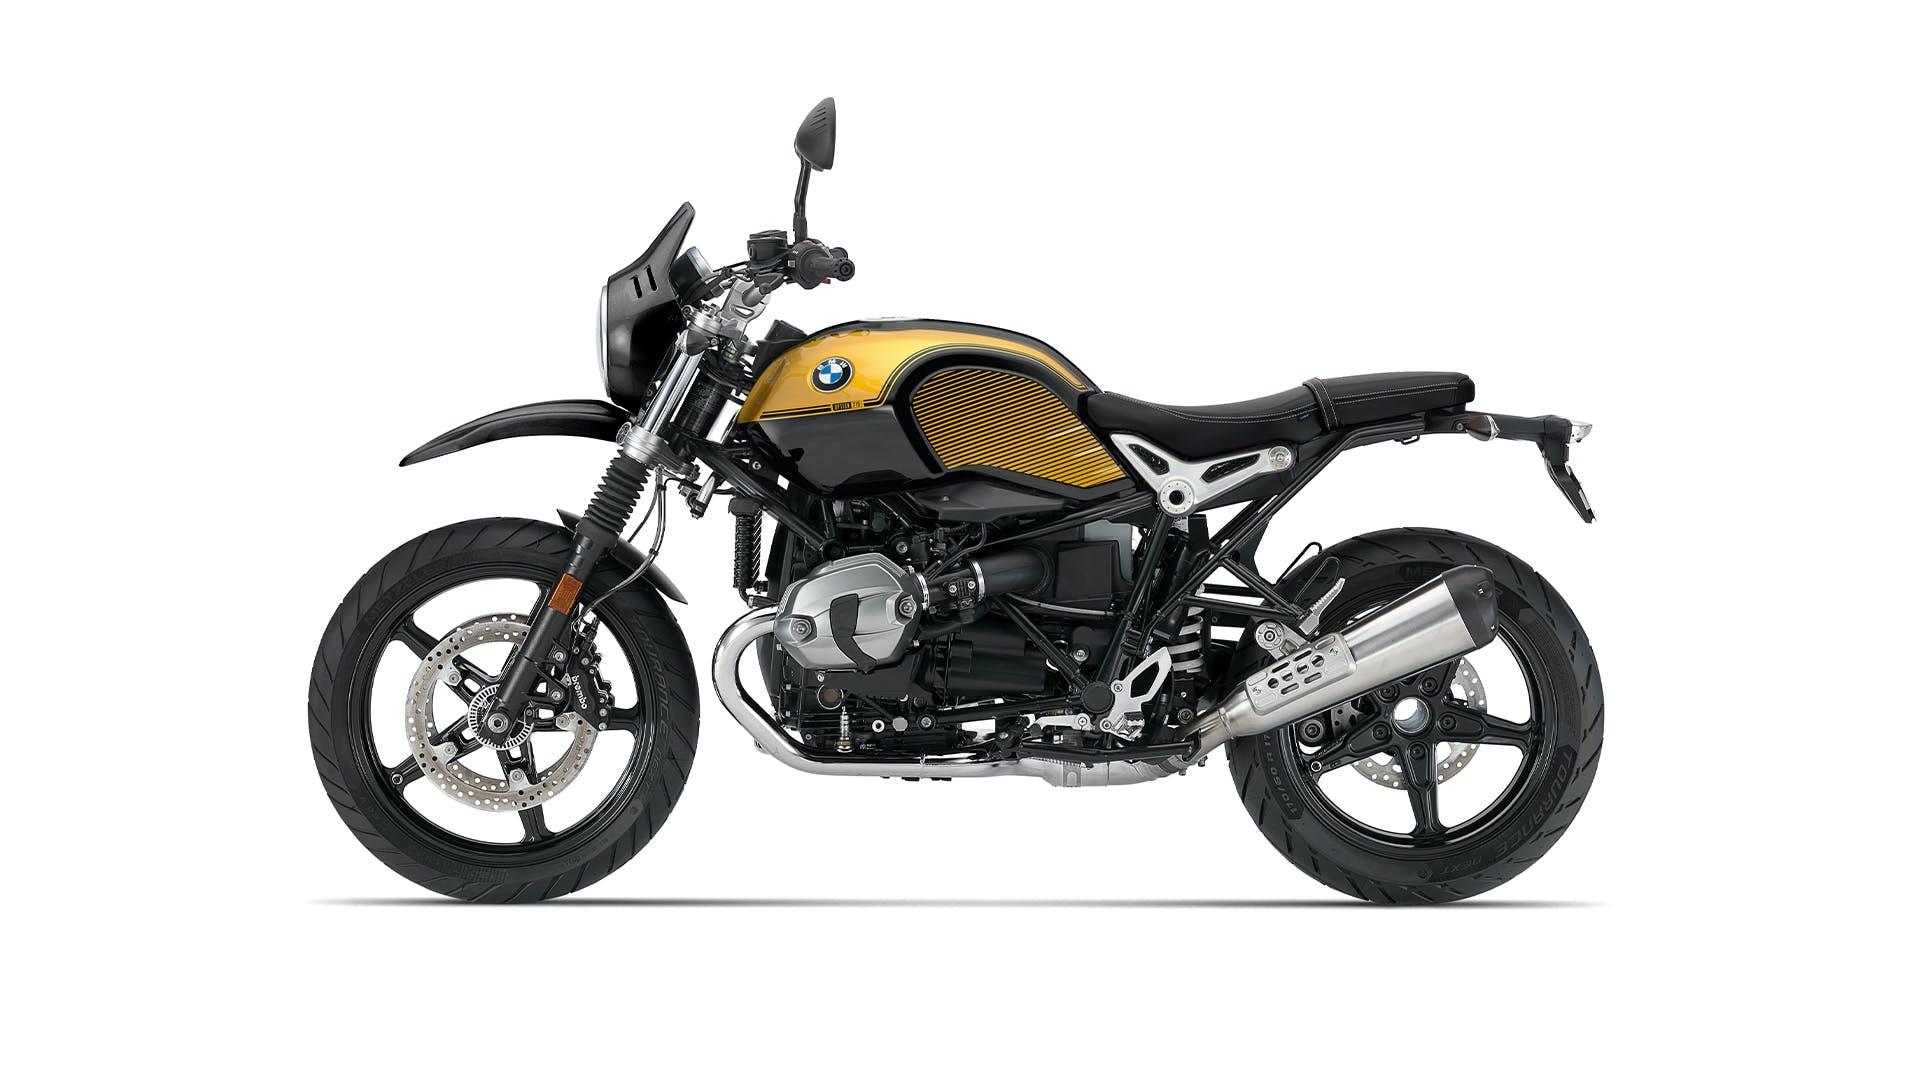 BMW R nineT Urban G/S Spezial in option 719 black storm metallic / aurum colour